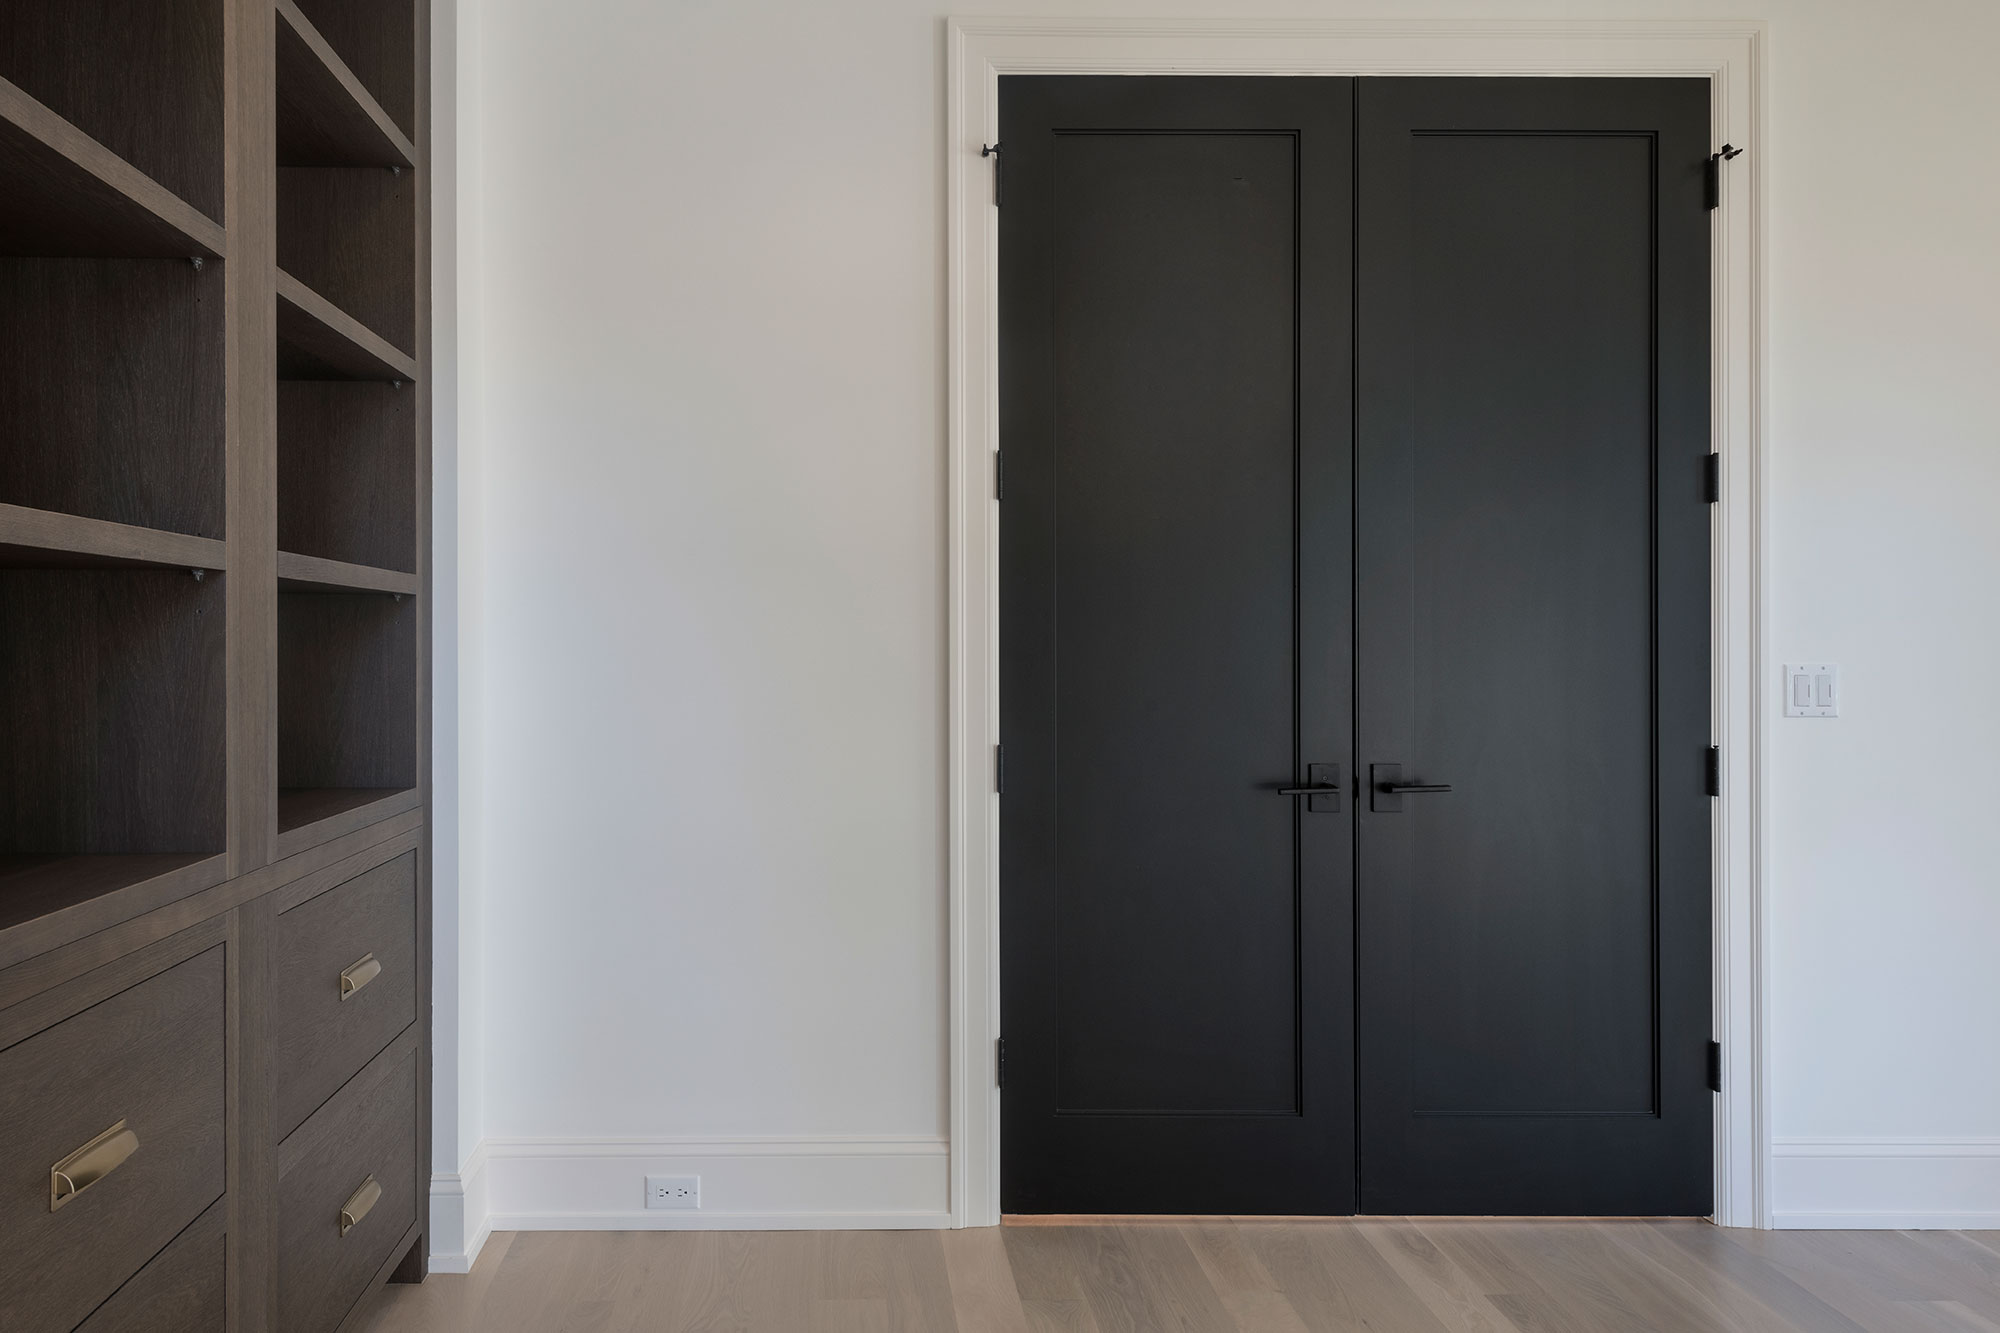 Custom Wood Interior Doors | black paint grade custom interior doors  - Glenview Doors - Custom Doors in Chicago